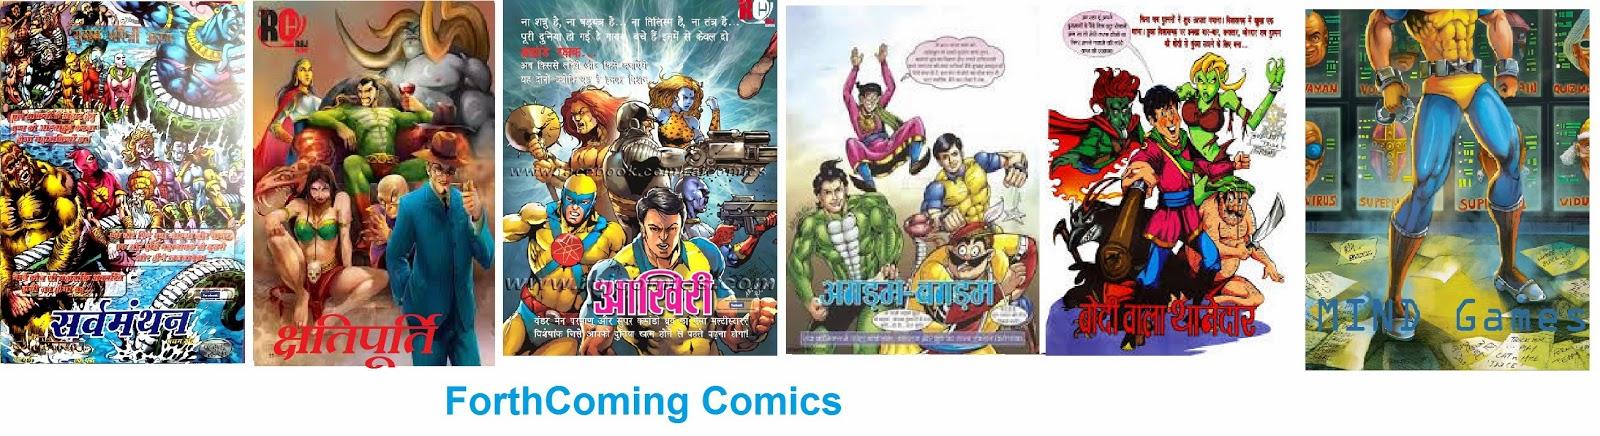 Set 1-2-3-4 of 2015 Details, Fourth Coming Sets